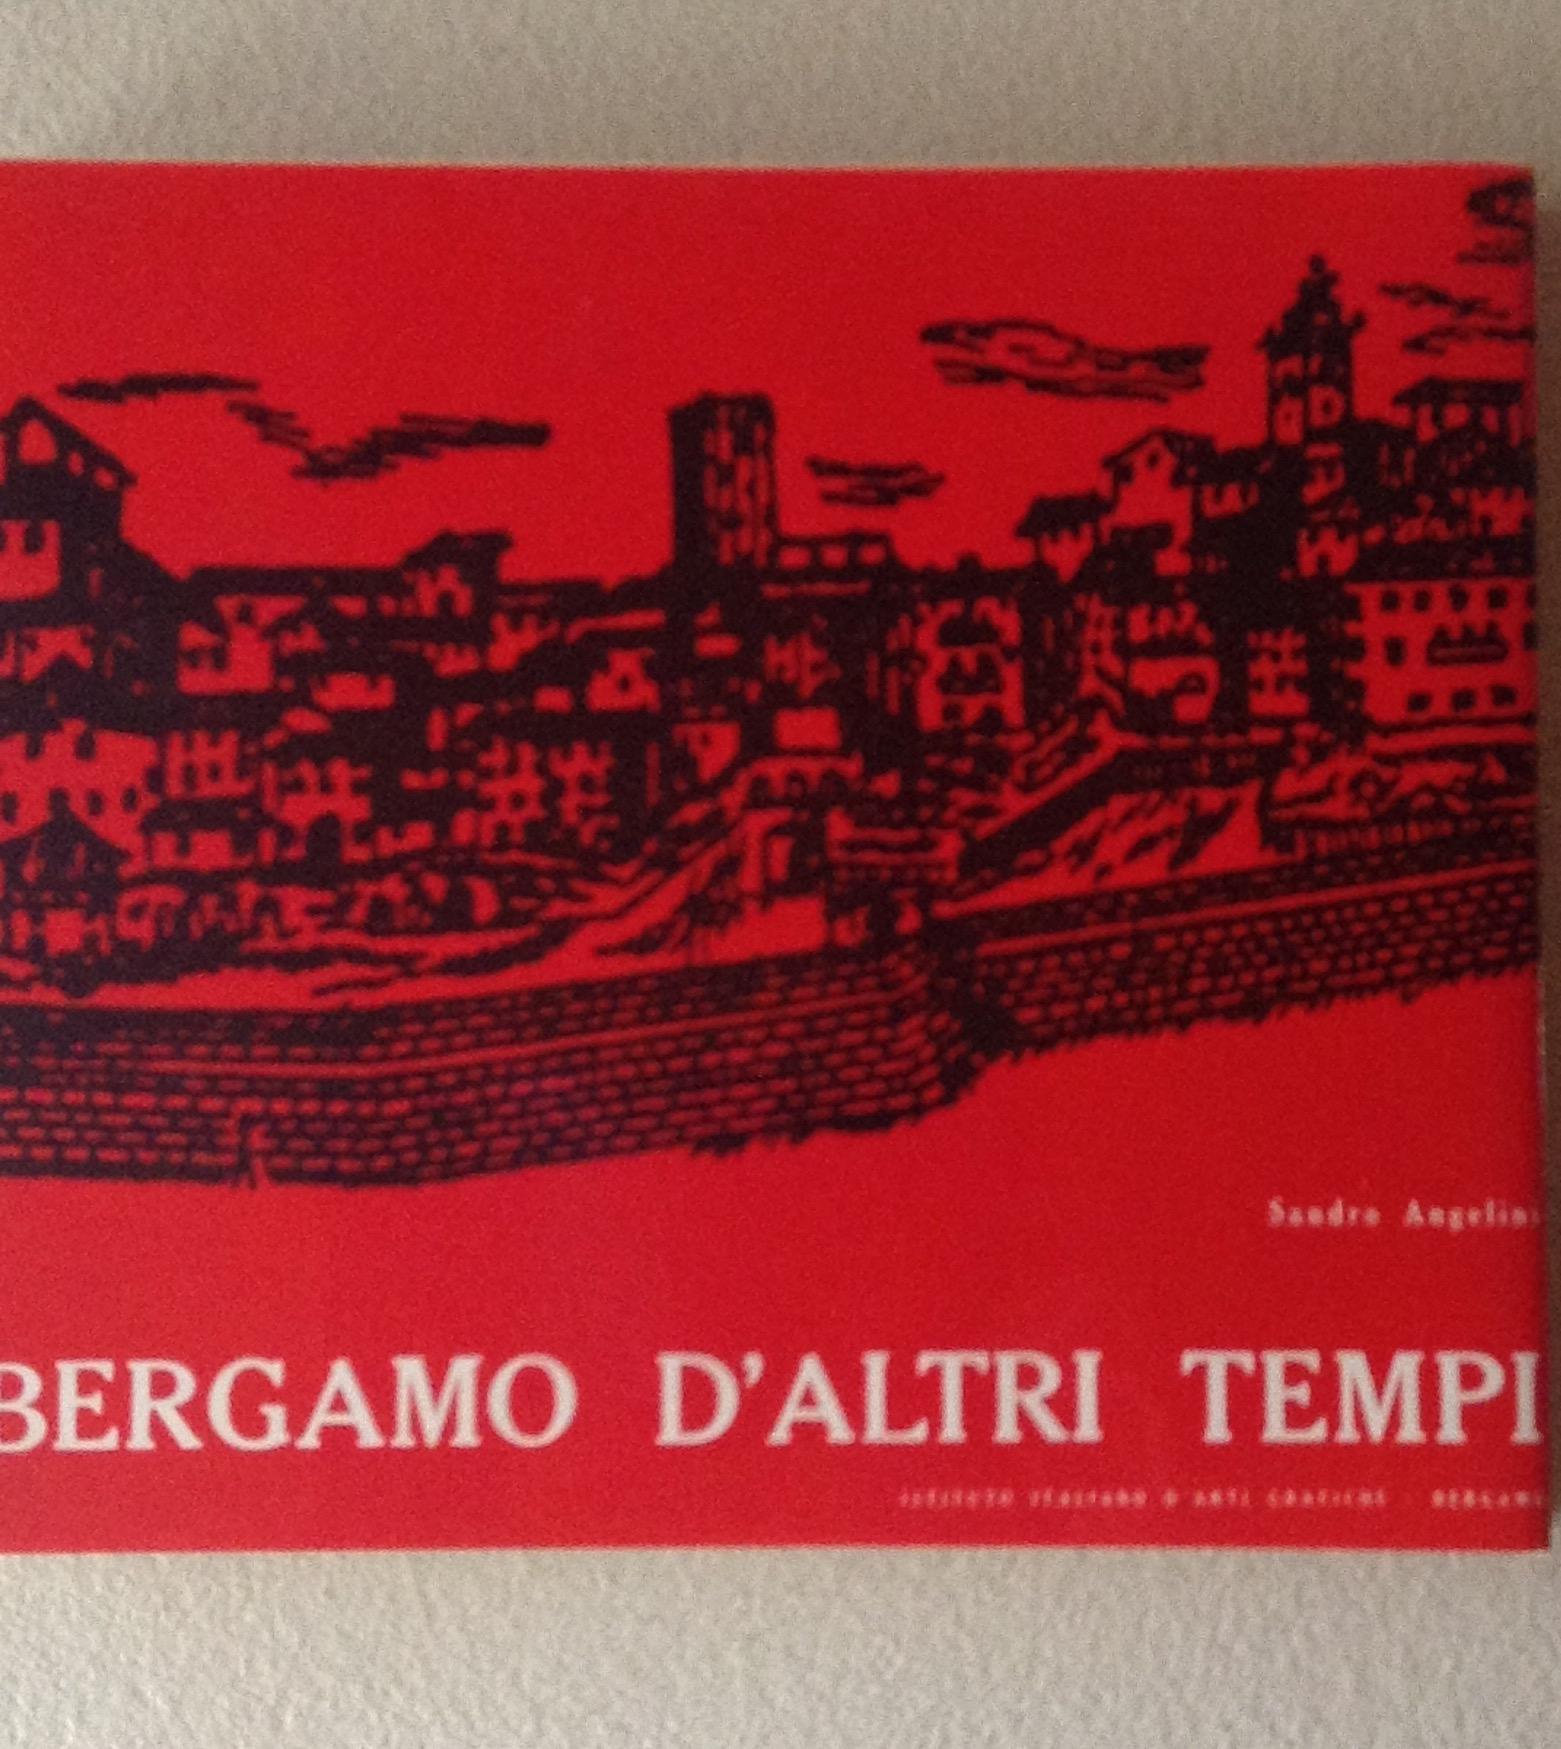 Bergamo d'altri temp...